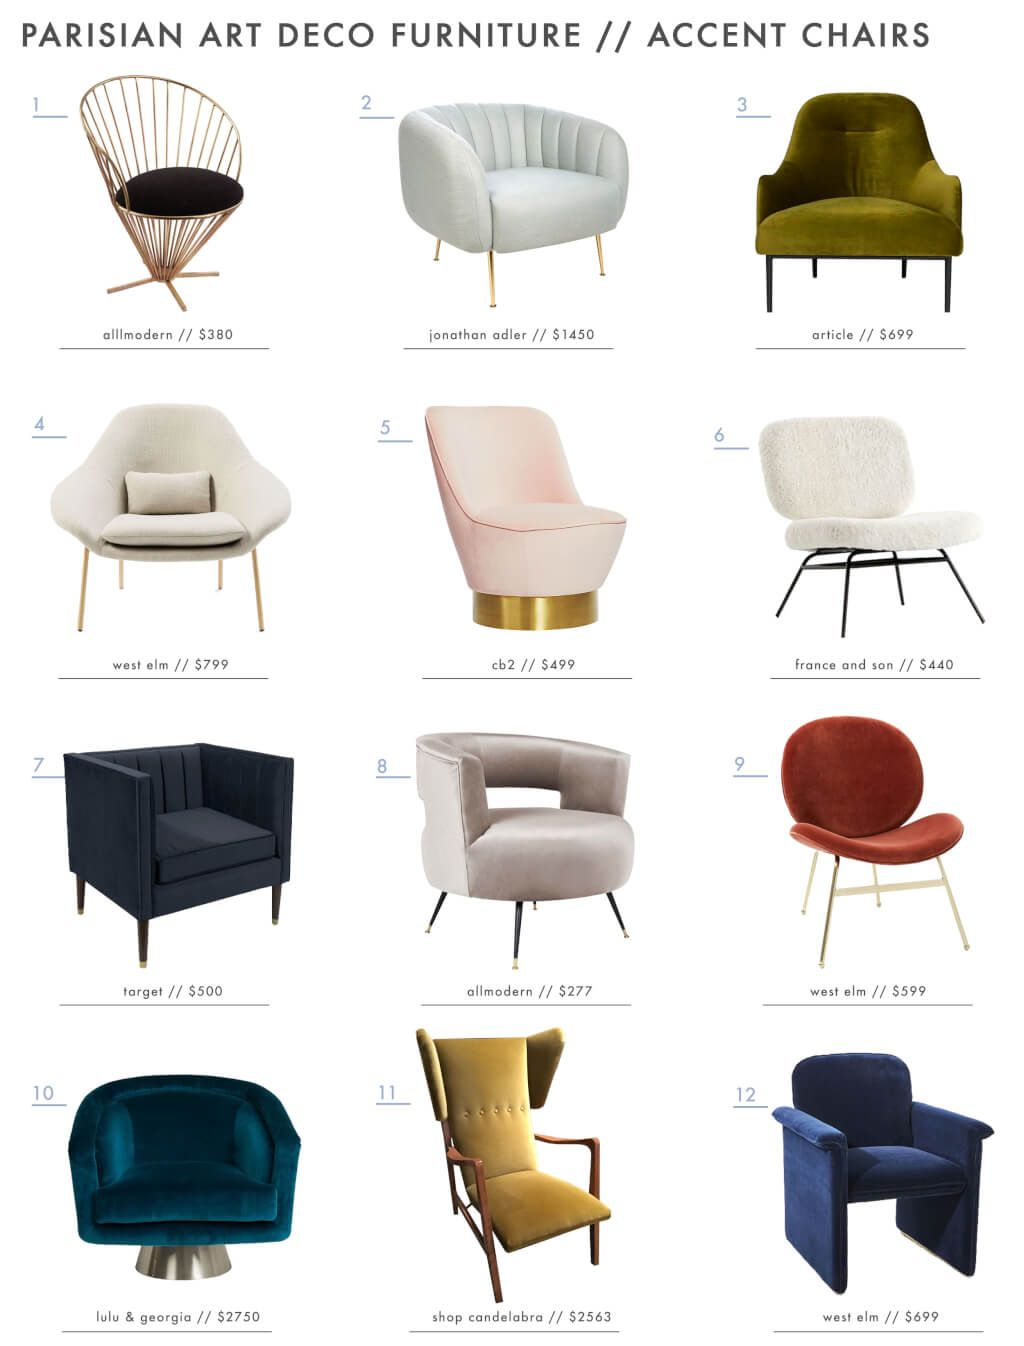 Achieving The Parisian Art Deco Style Furniture Emily Henderson Art Deco Interior Deco Furniture Art Deco Interior Design